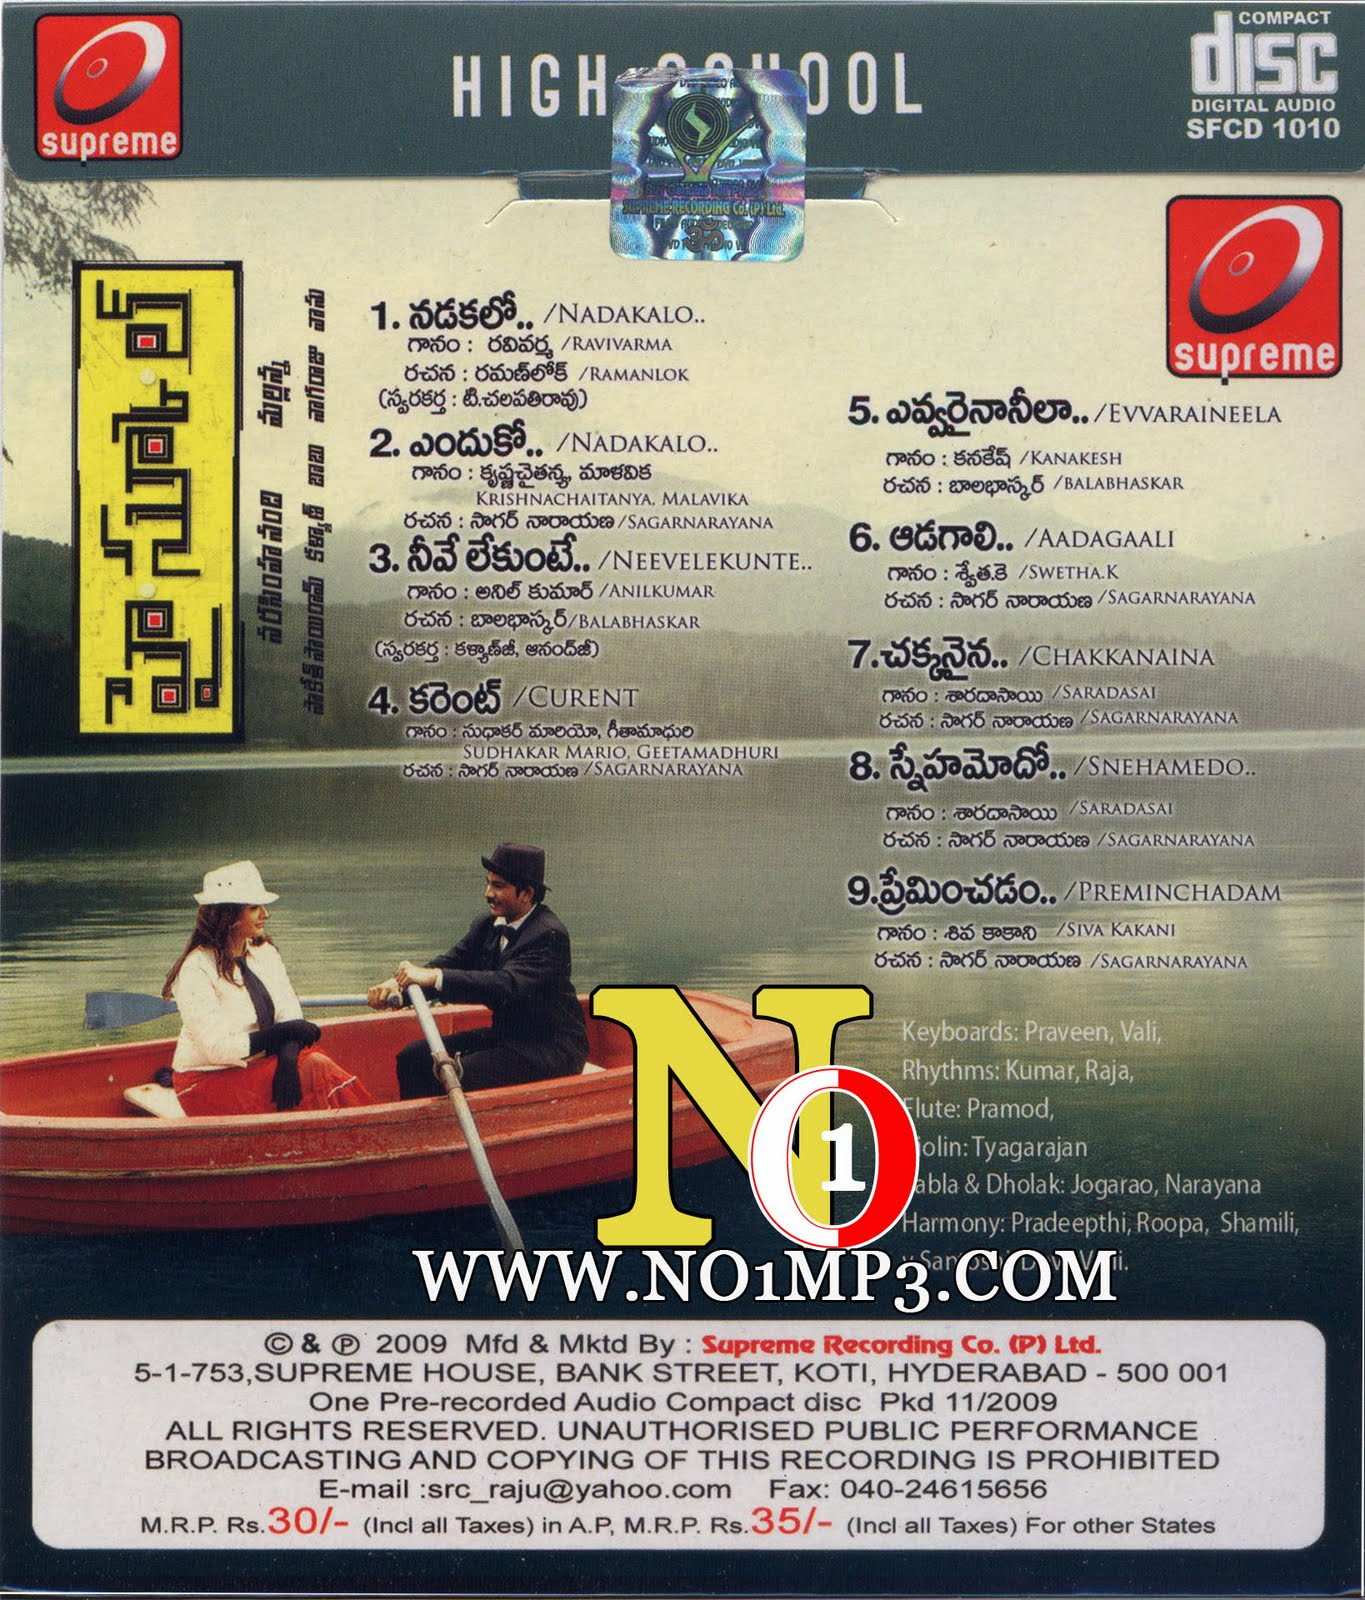 Avatar 2 Full Movie In Telugu: High School (2009) 128&320 Kbps Mp3 Telugu Movie Audio Mp3